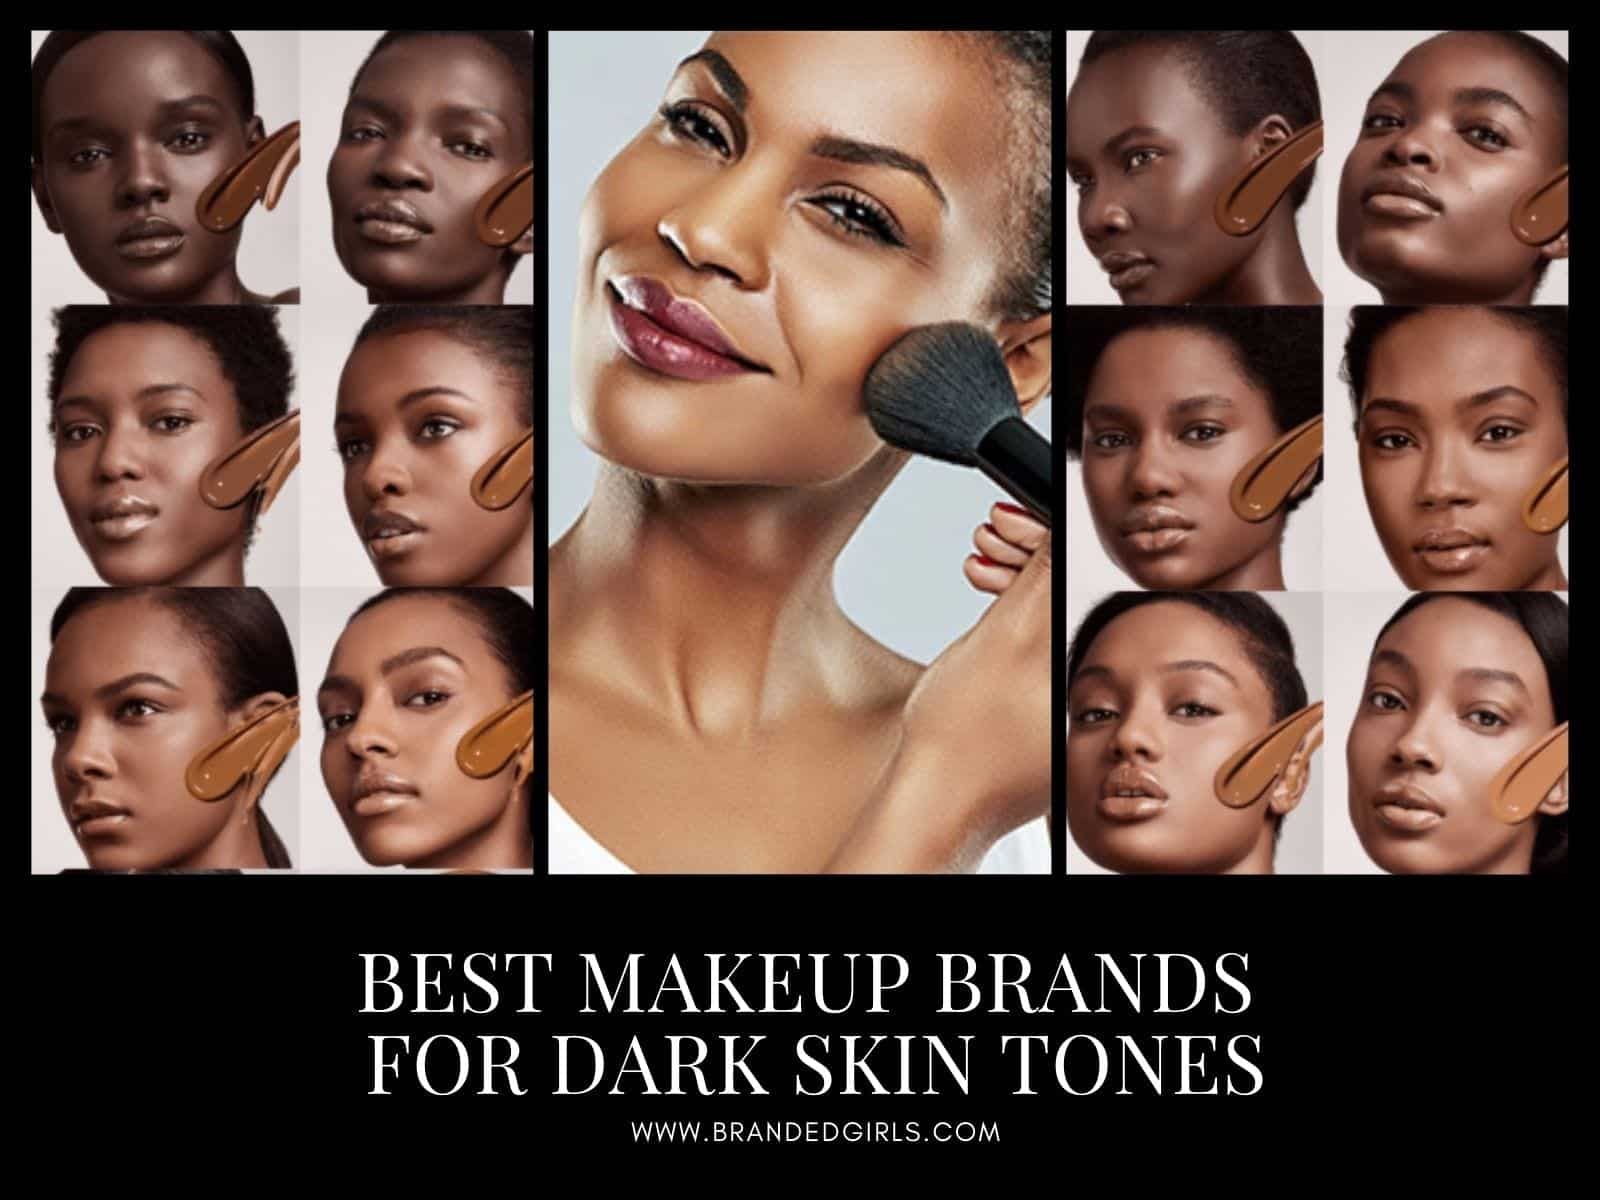 Makeup Brands For Dark Skin Tones